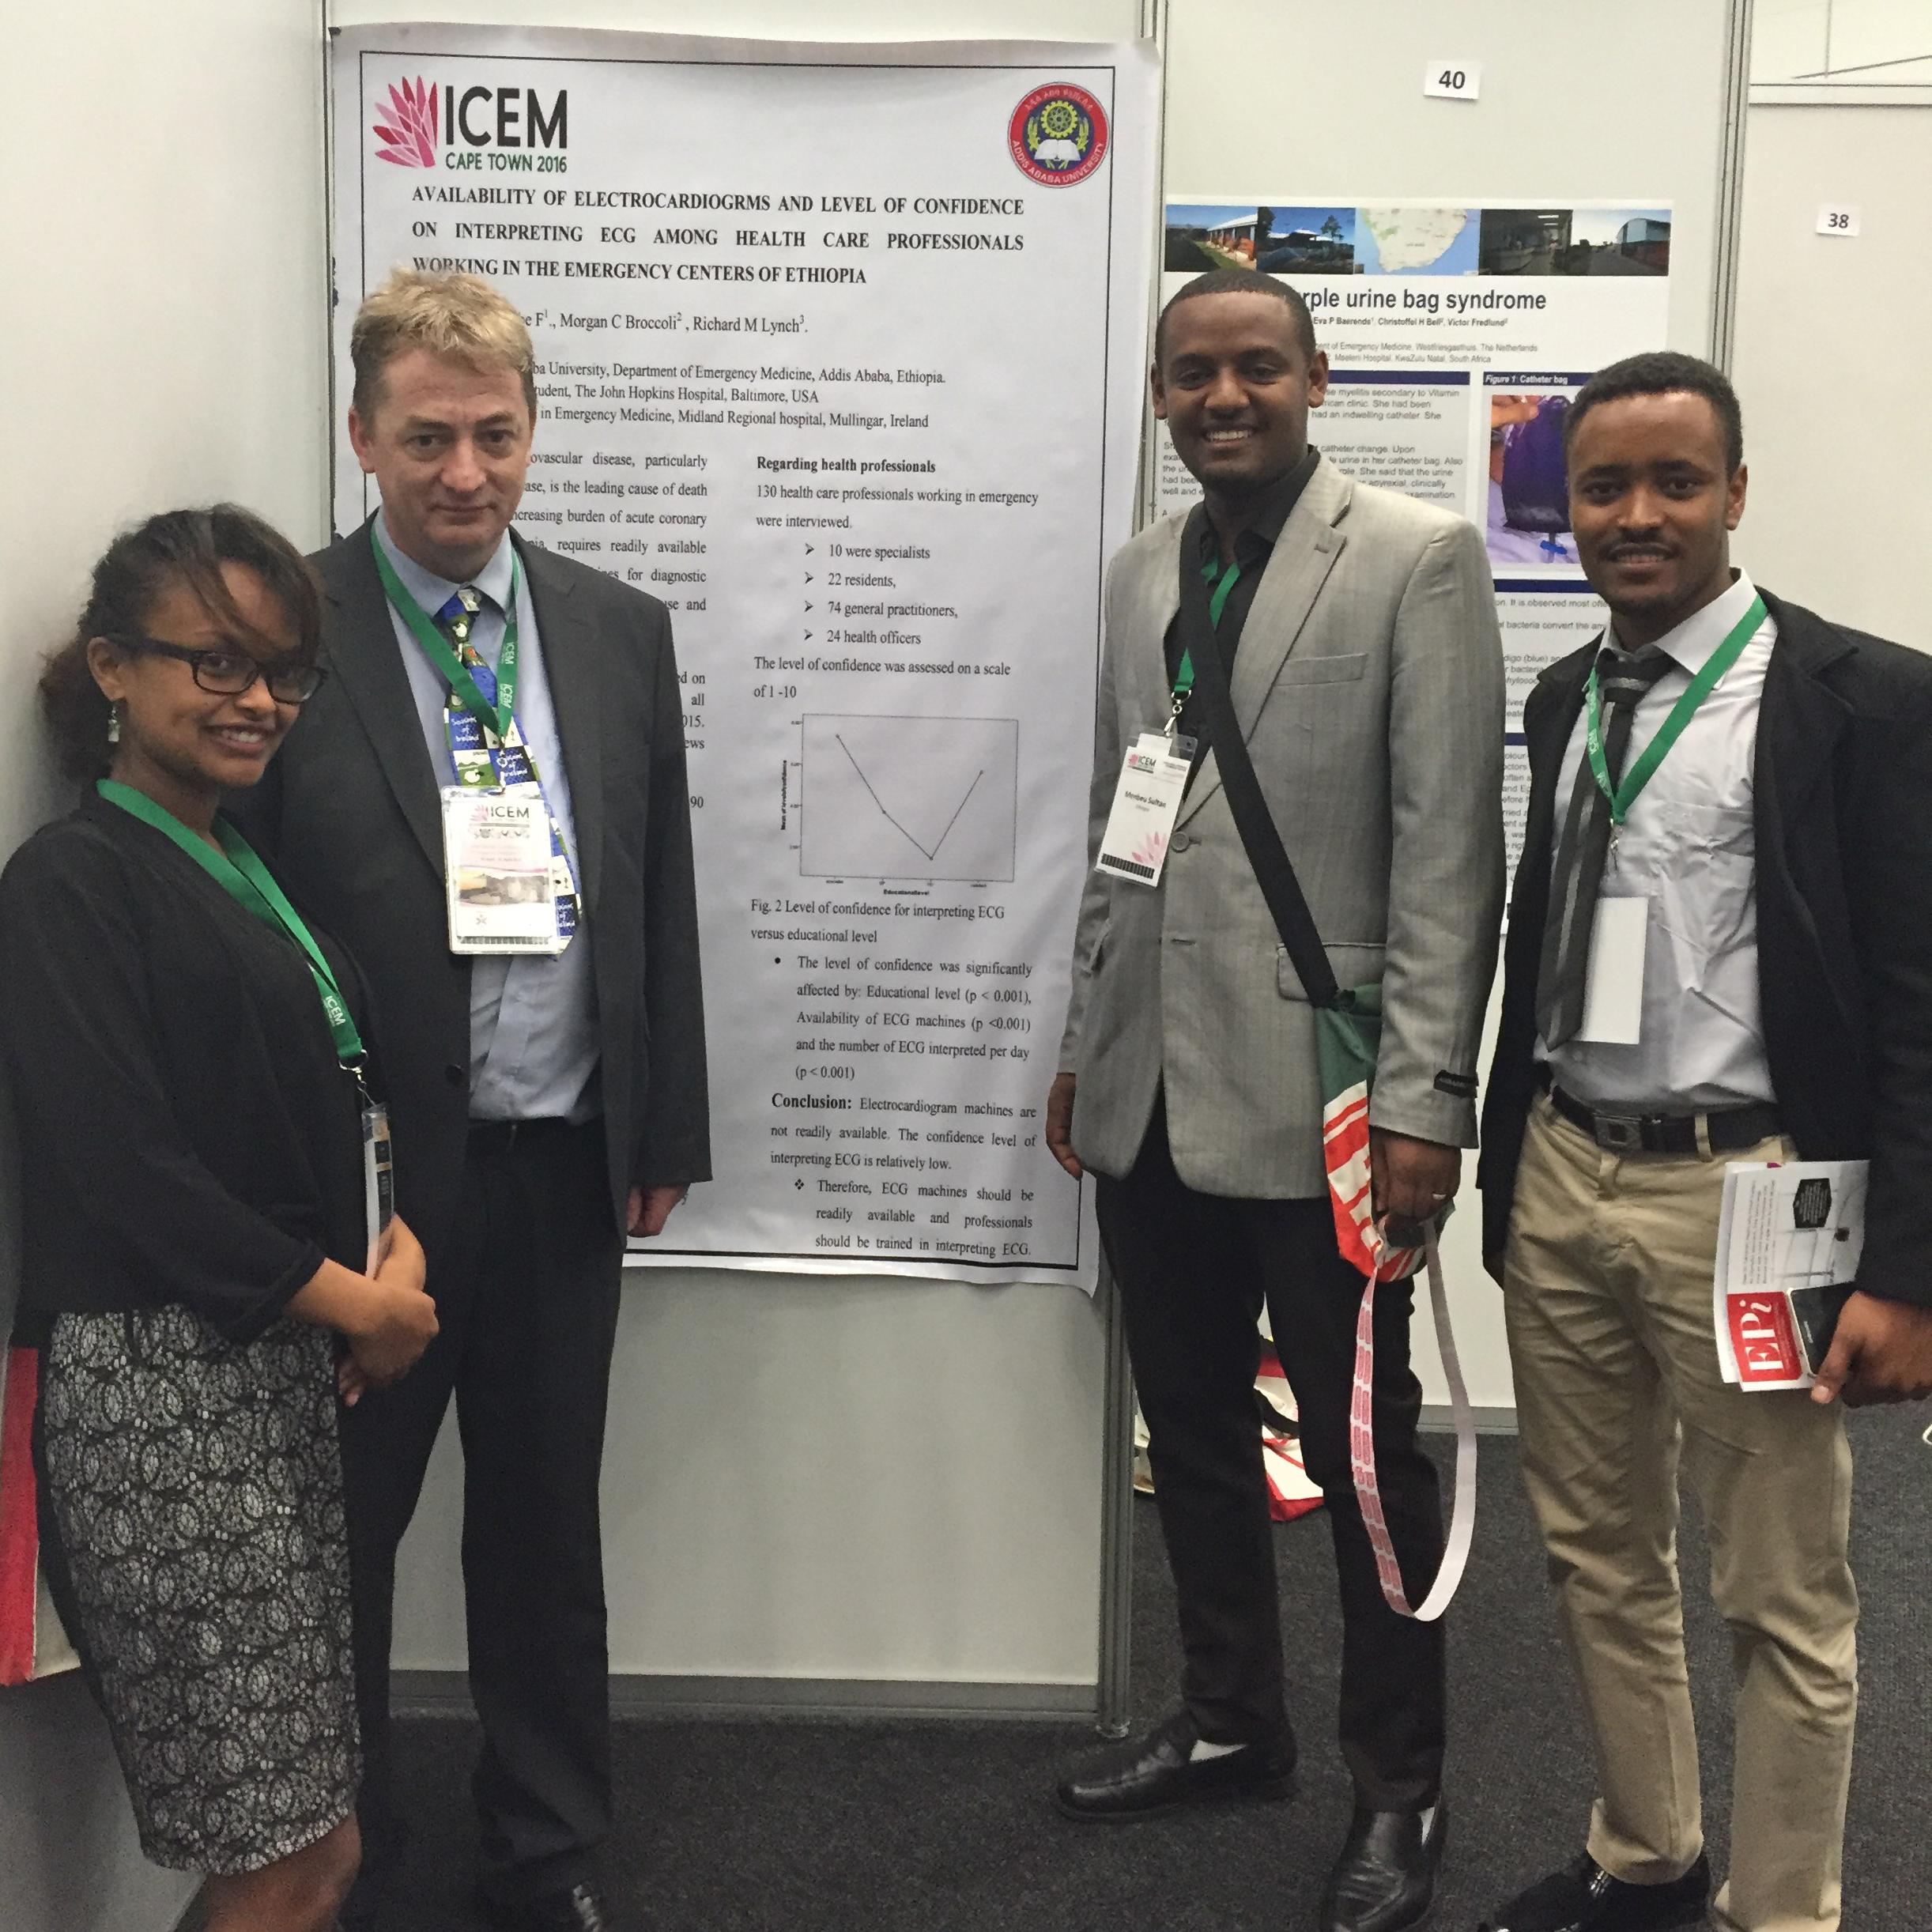 Irish/Ethiopian study highlights a lack of ECGs